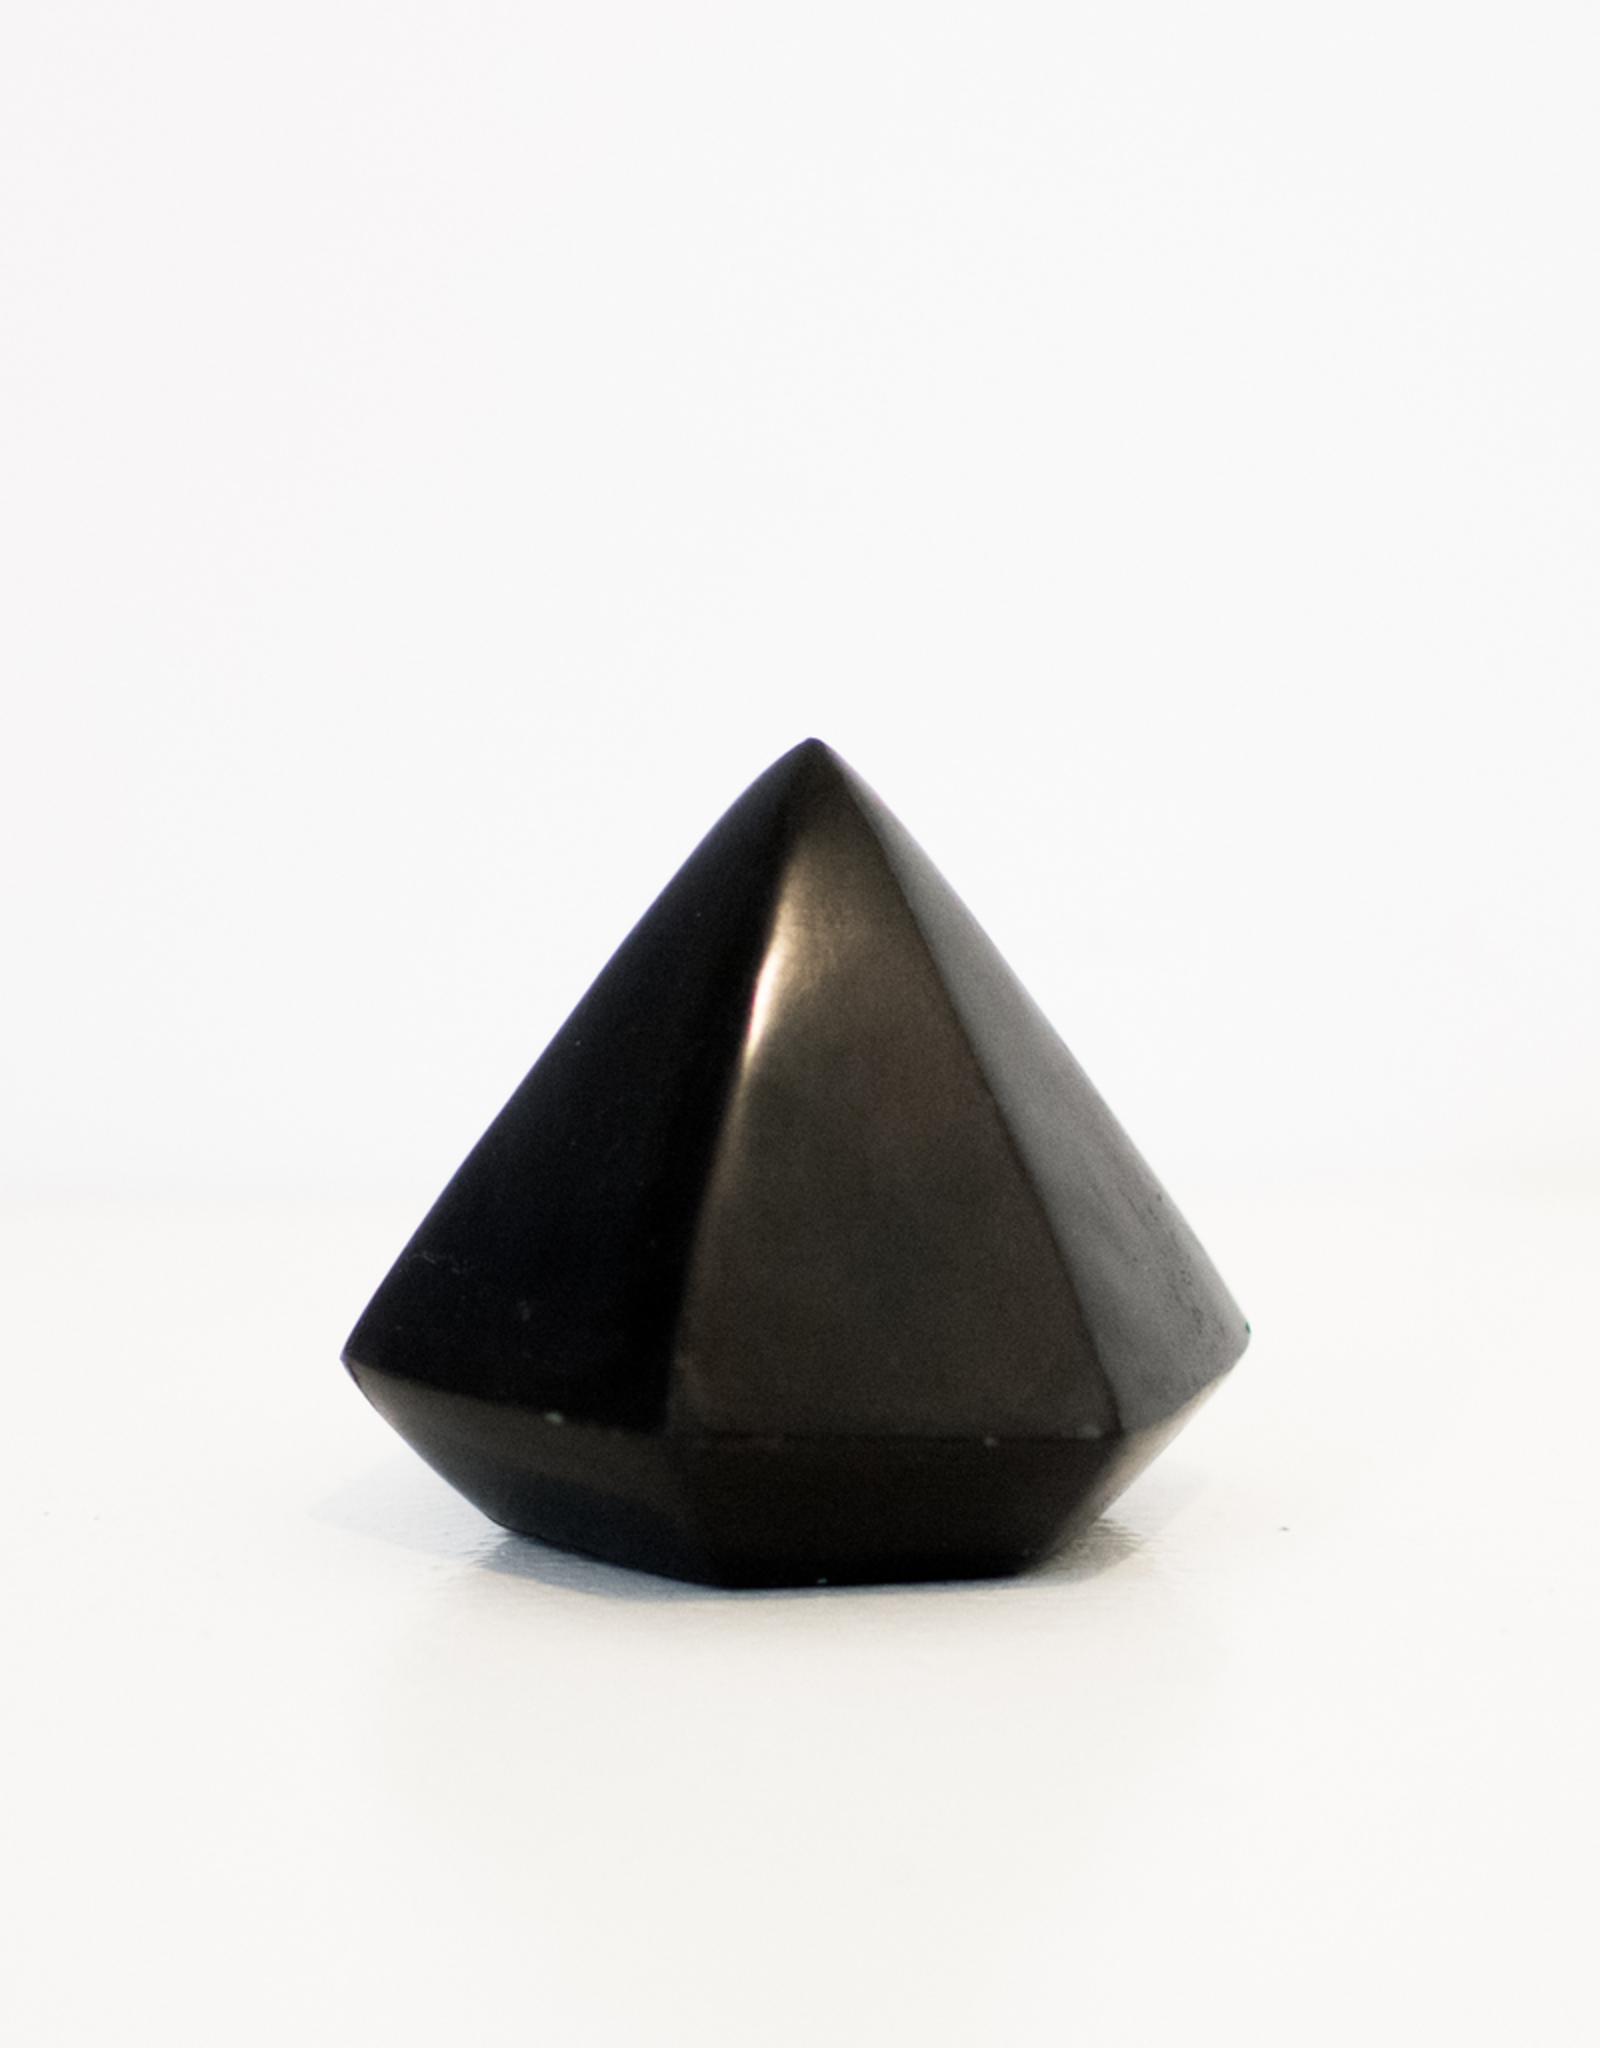 Geometric Object, Black Soapstone, Diamond